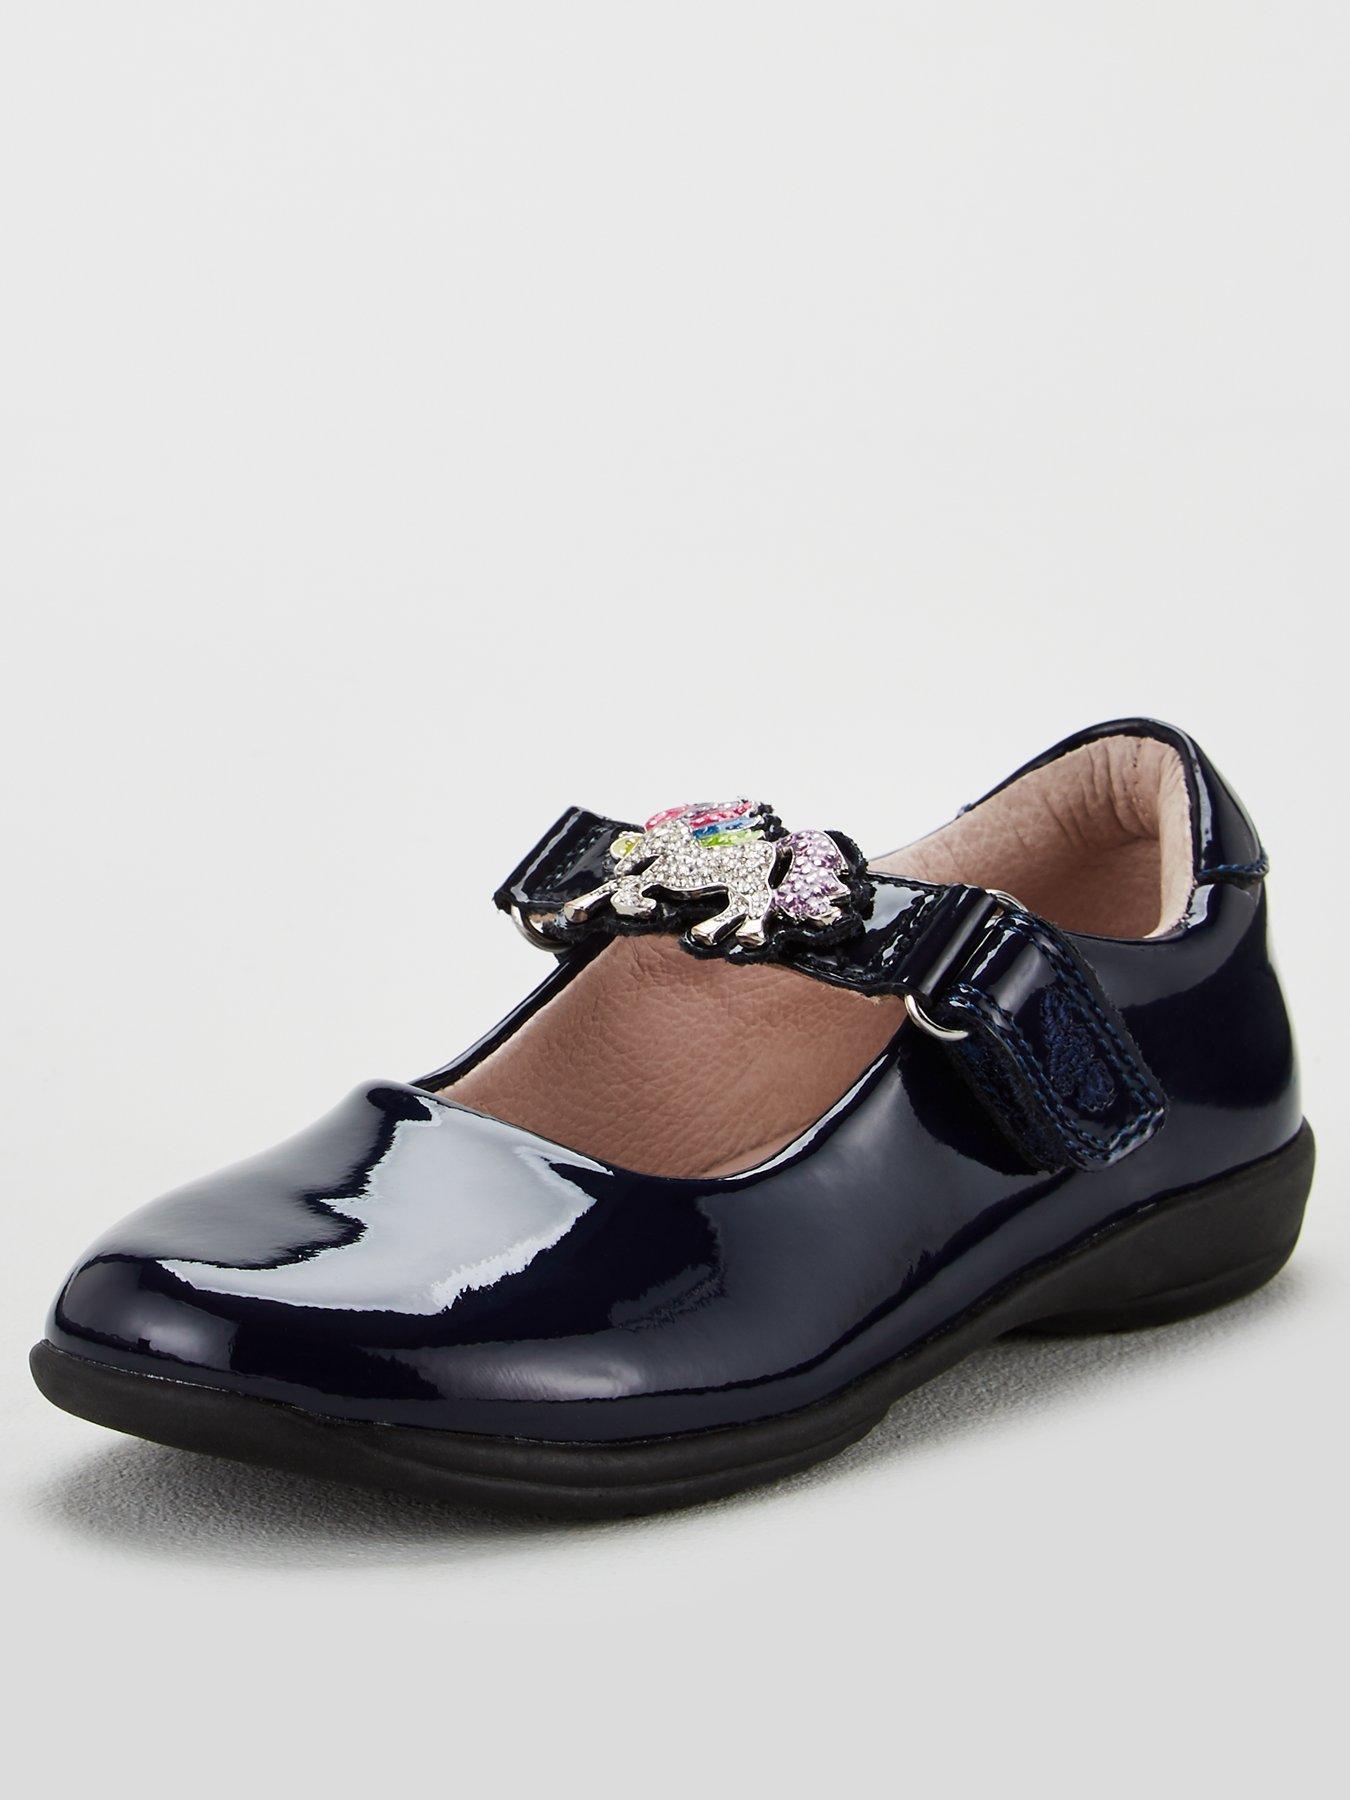 Dolly Babe Girls Clarks/' Rounded Toe Riptape Strap School Shoe